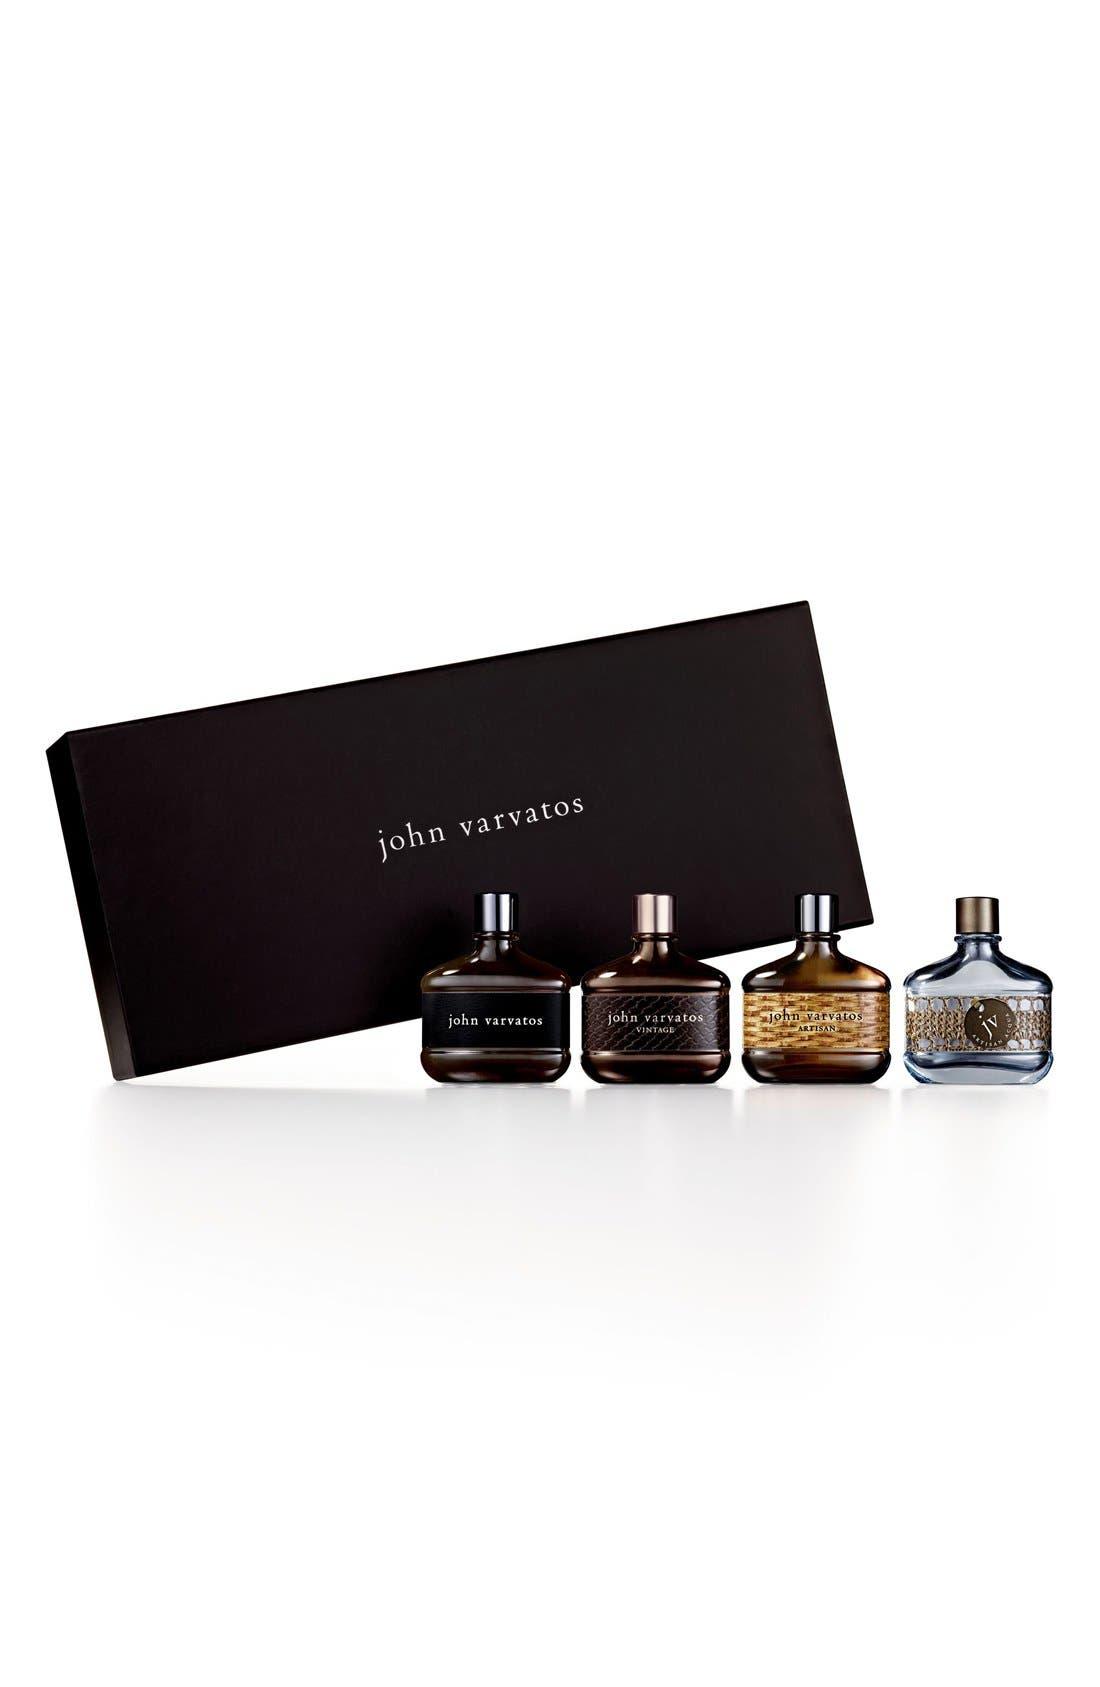 John Varavatos Fragrance Coffret